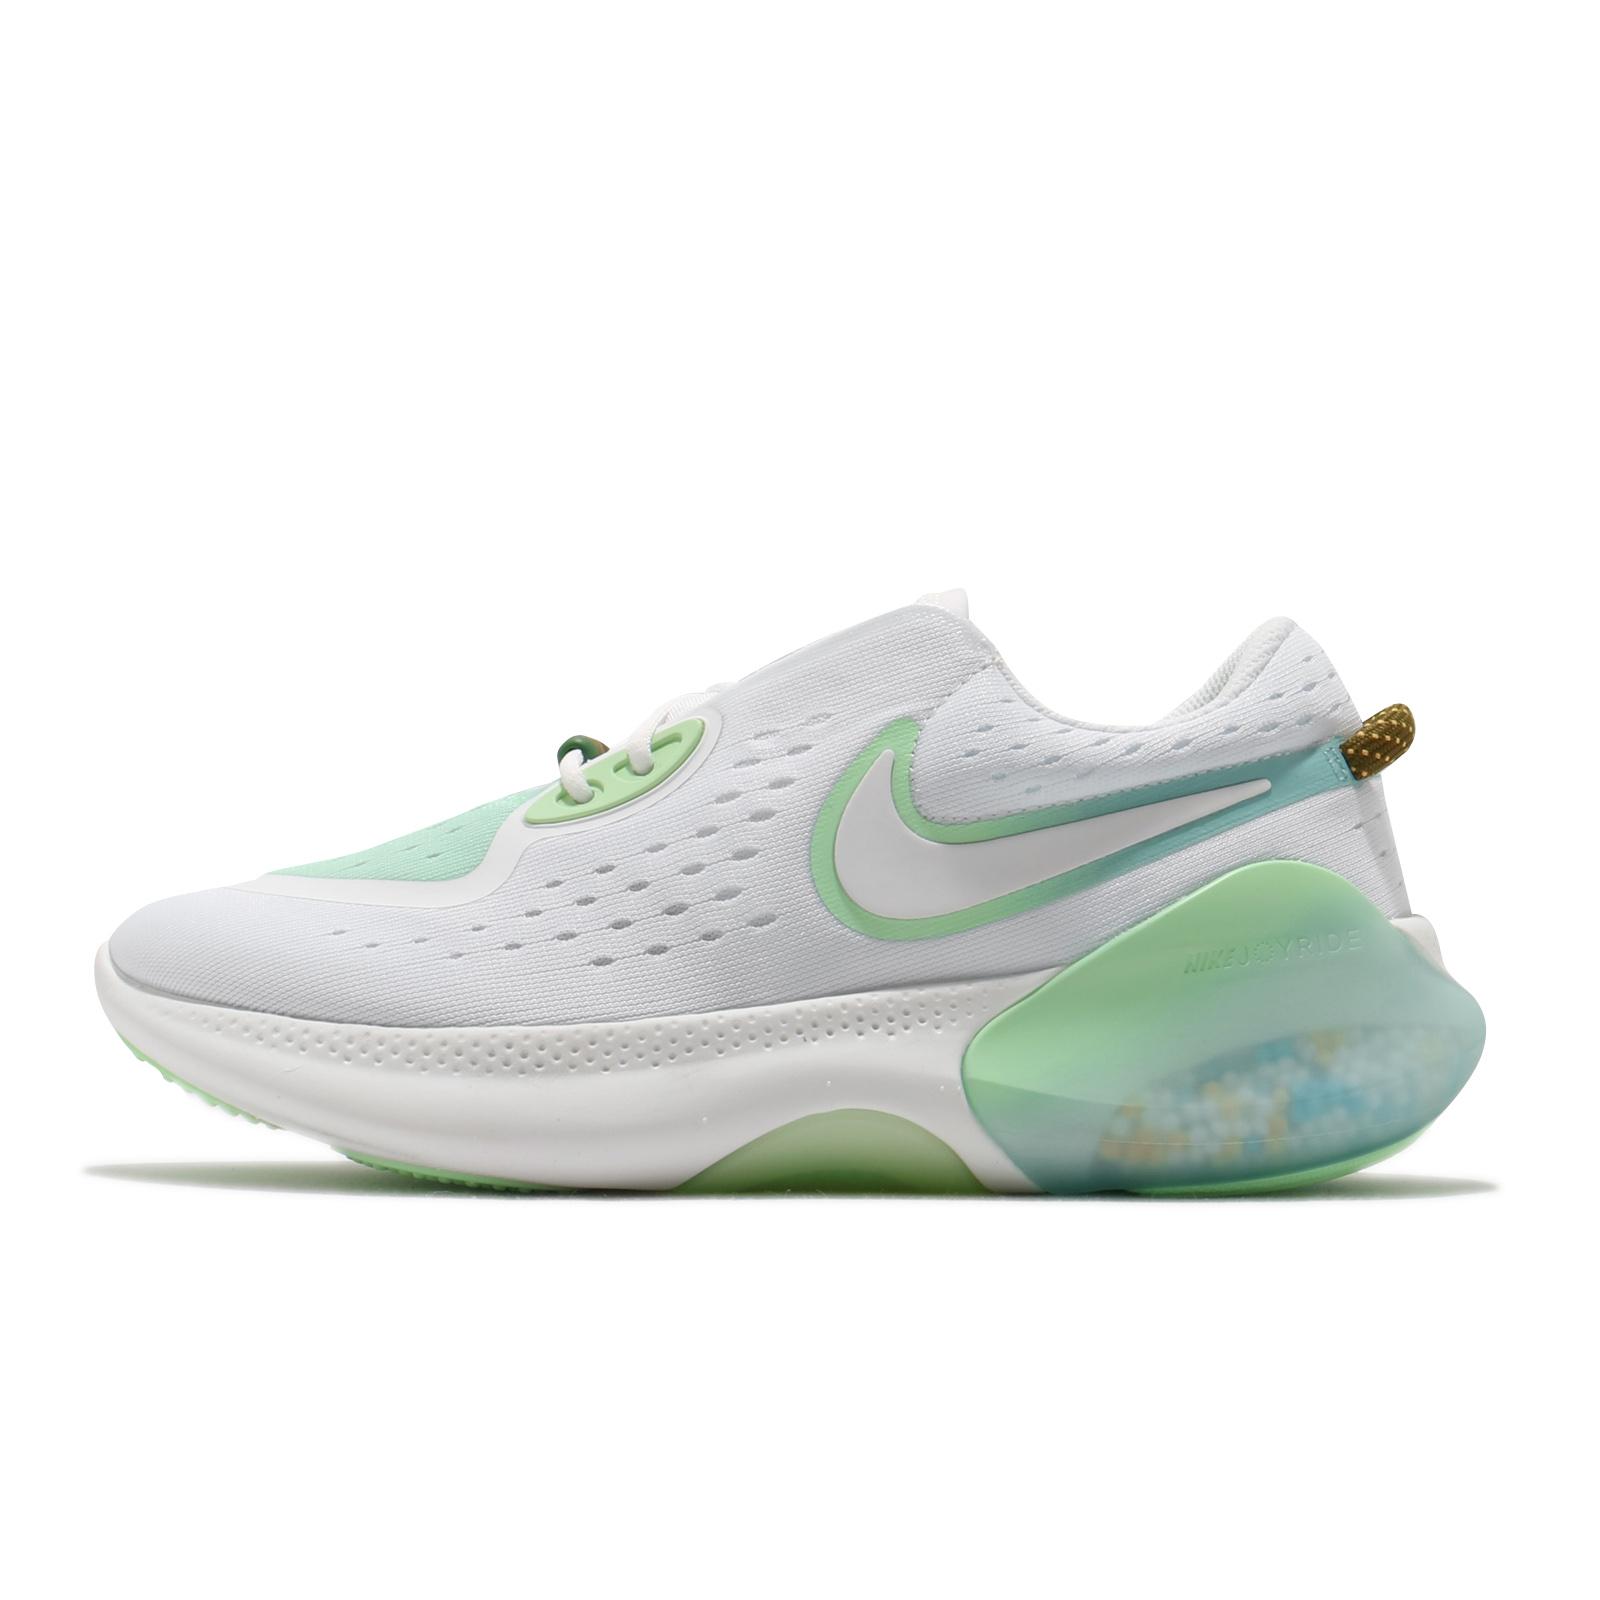 Nike 慢跑鞋 Wmns Joyride Dual Run 白 綠 藍 女鞋 運動鞋 【ACS】 DA1843-111